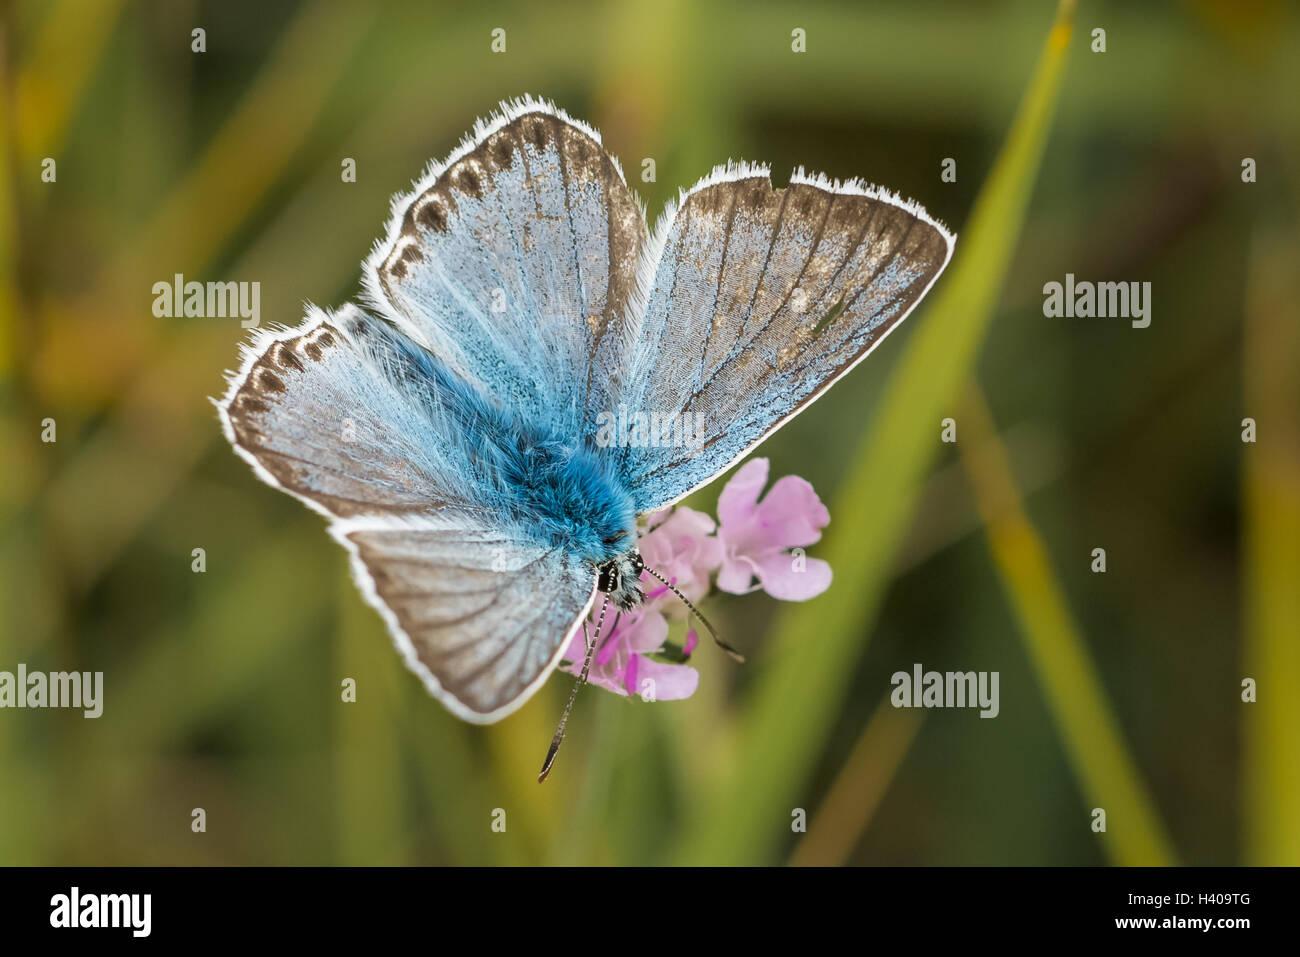 Male Chalkhill Blue butterfly (Polyommatus / Lysandra coridon) on small Scabious flower Stock Photo